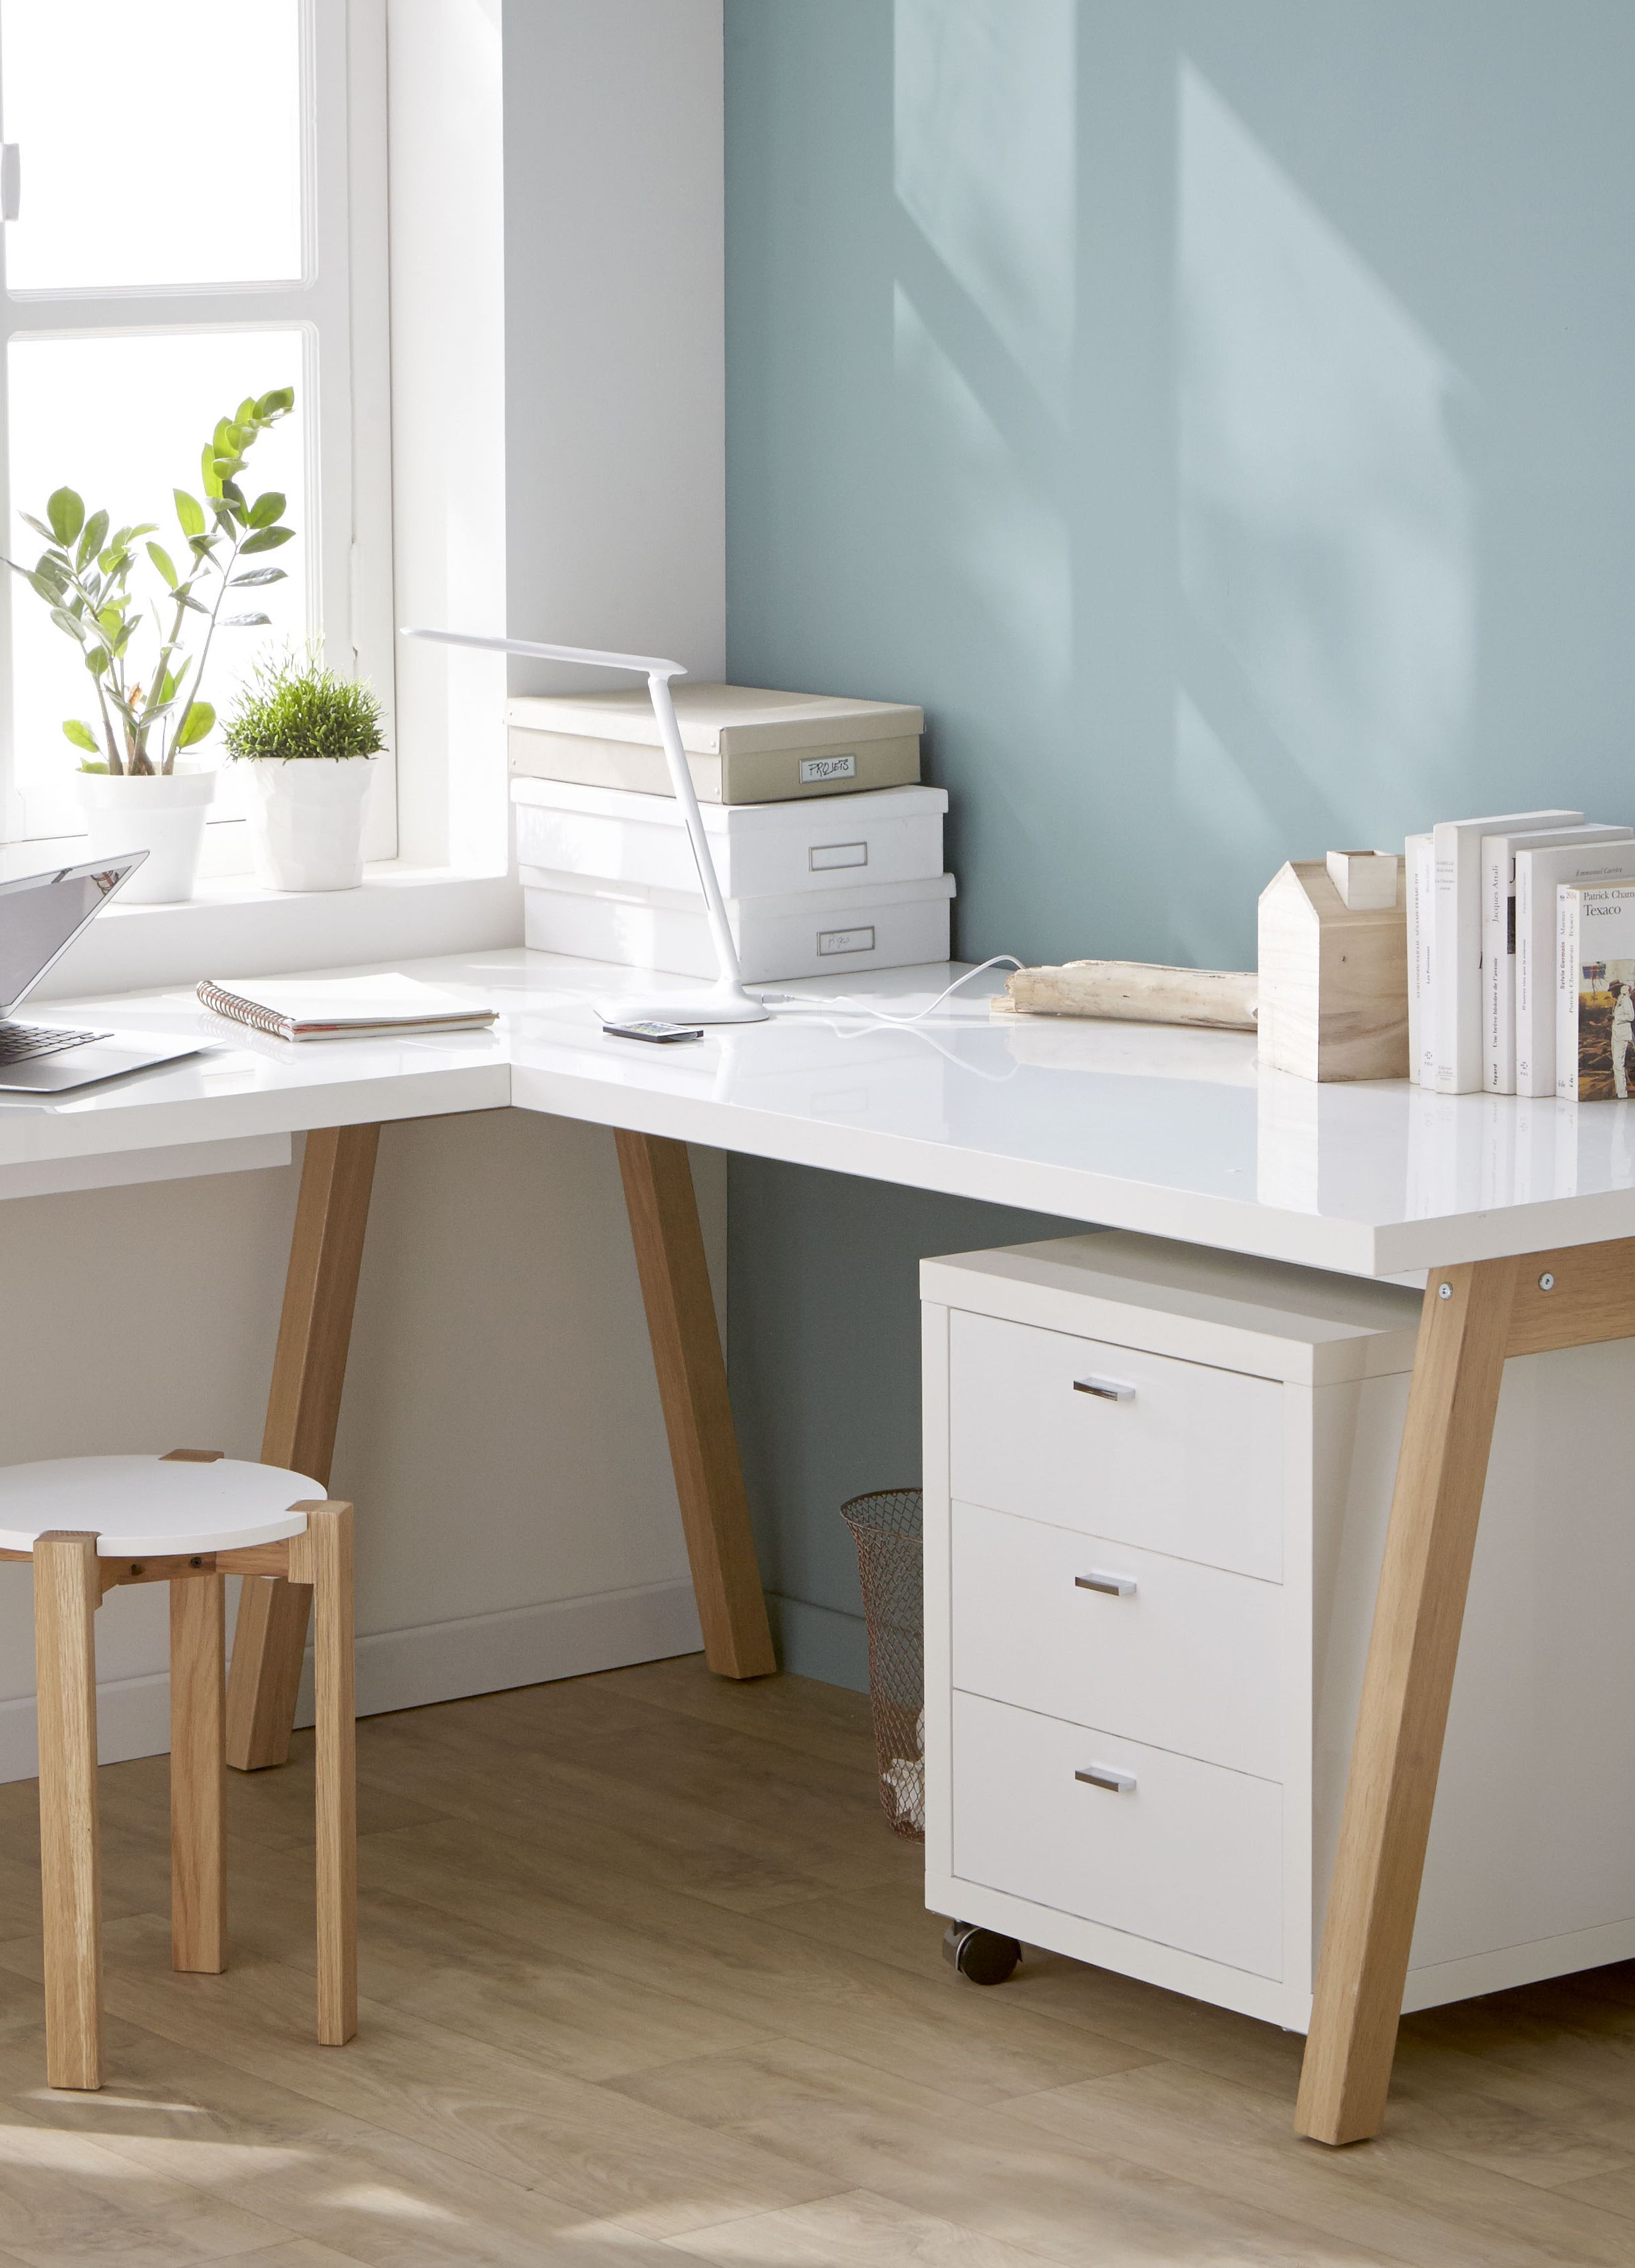 Bureau D Angle Ikea : bureau, angle, Bureau, Blanc, D'angle, Piétement, Massif, Décoration, Déco, Maison, Alinéa, Angle,, Blanc,, Domicile